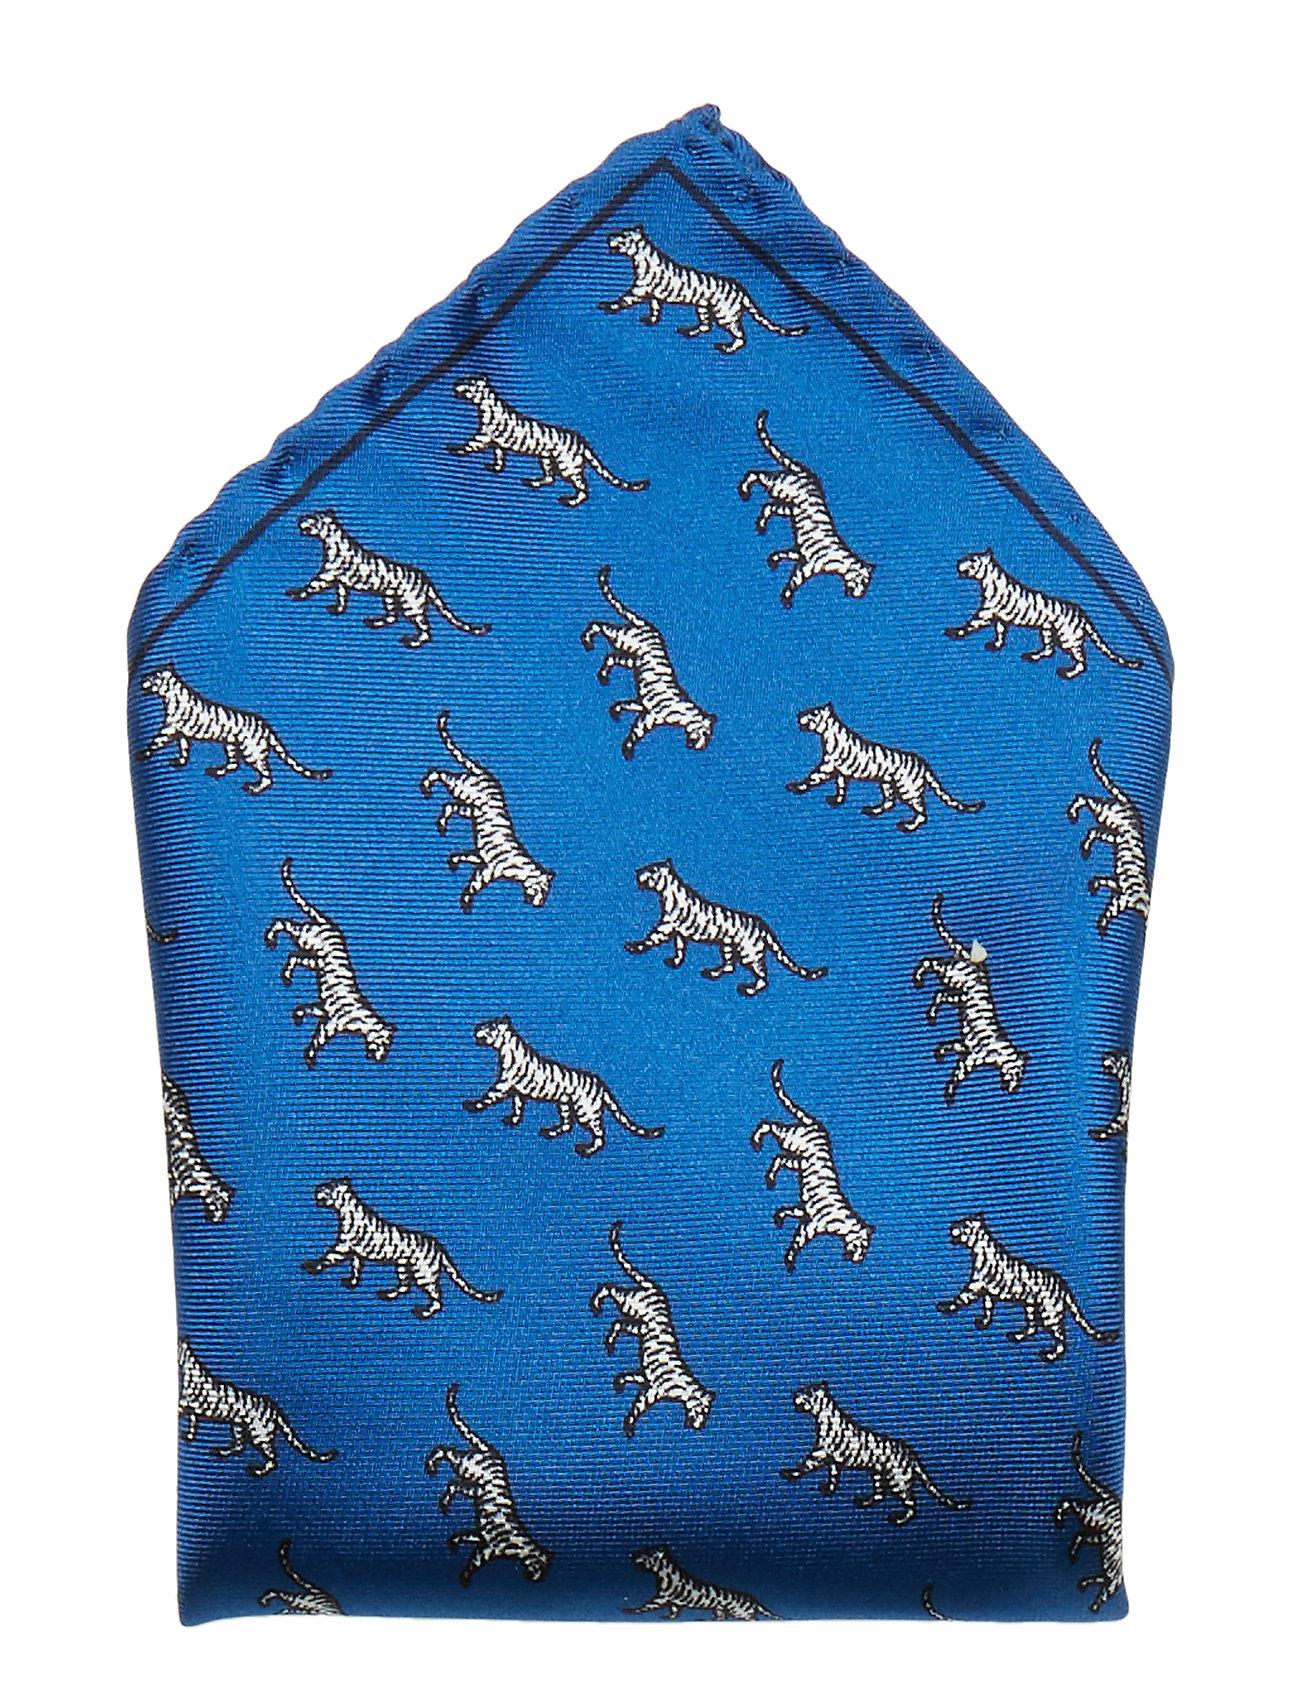 Plex Brystlommetørklæde Blå Tiger Of Sweden